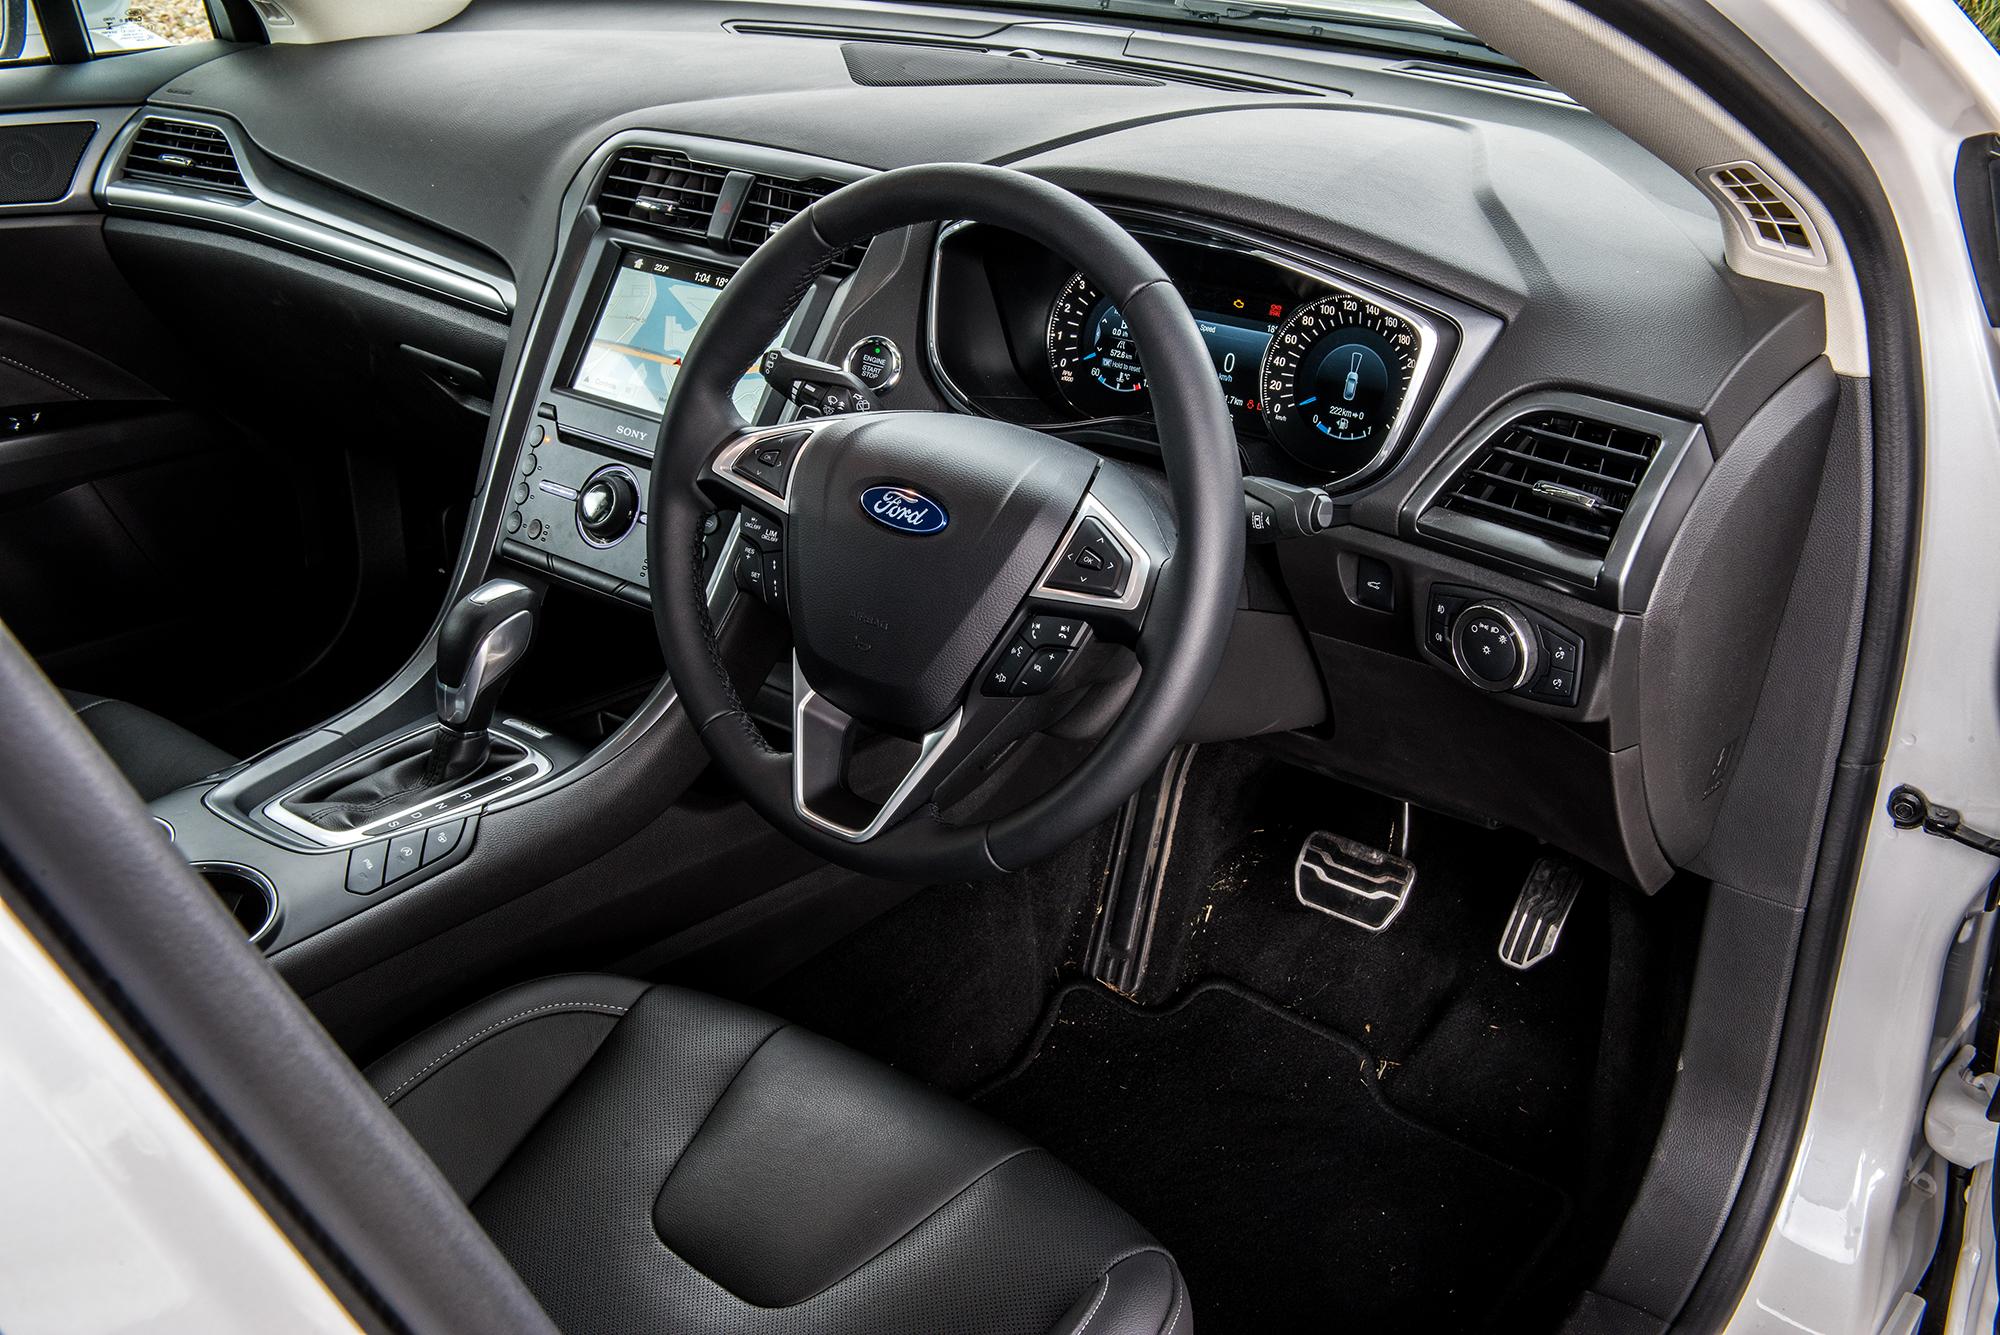 2018 Ford Mondeo Titanium TDCi review | CarAdvice